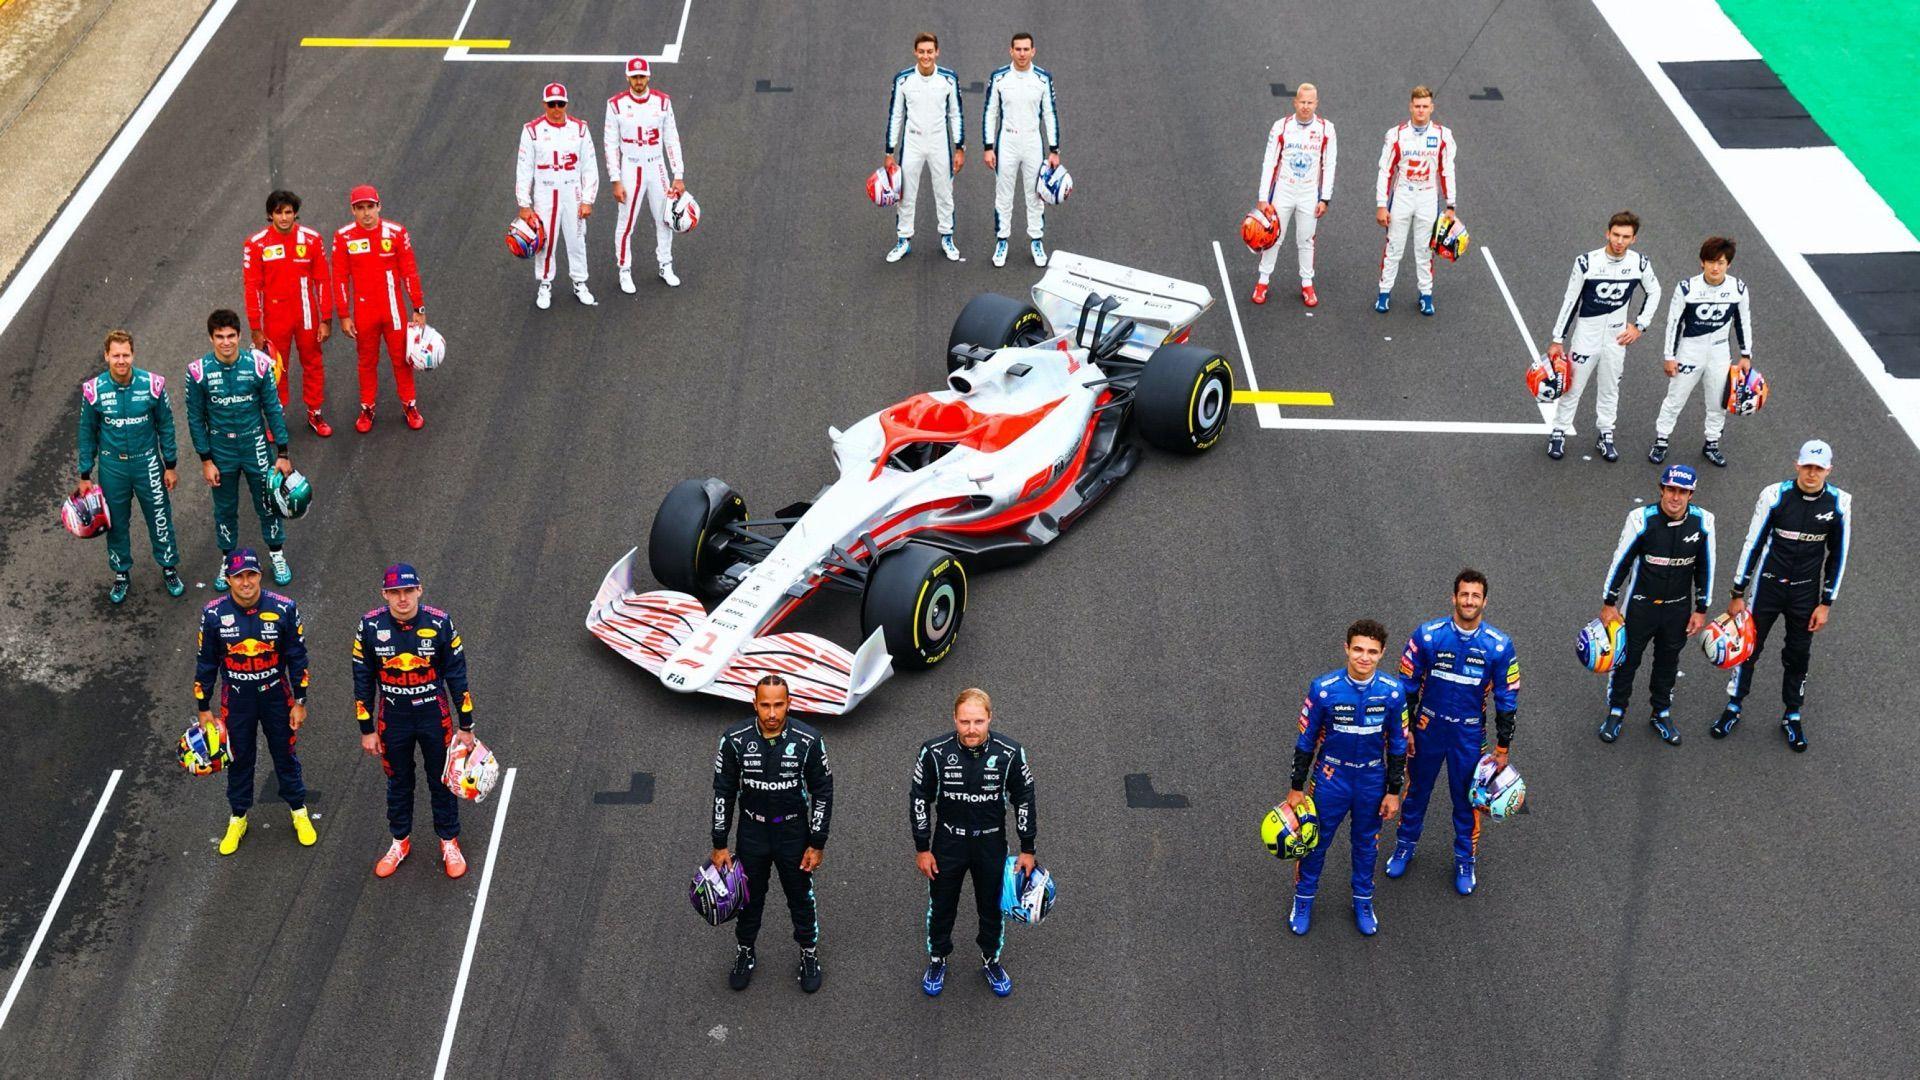 F1-Formula-1-car-2022-1_1920x1080